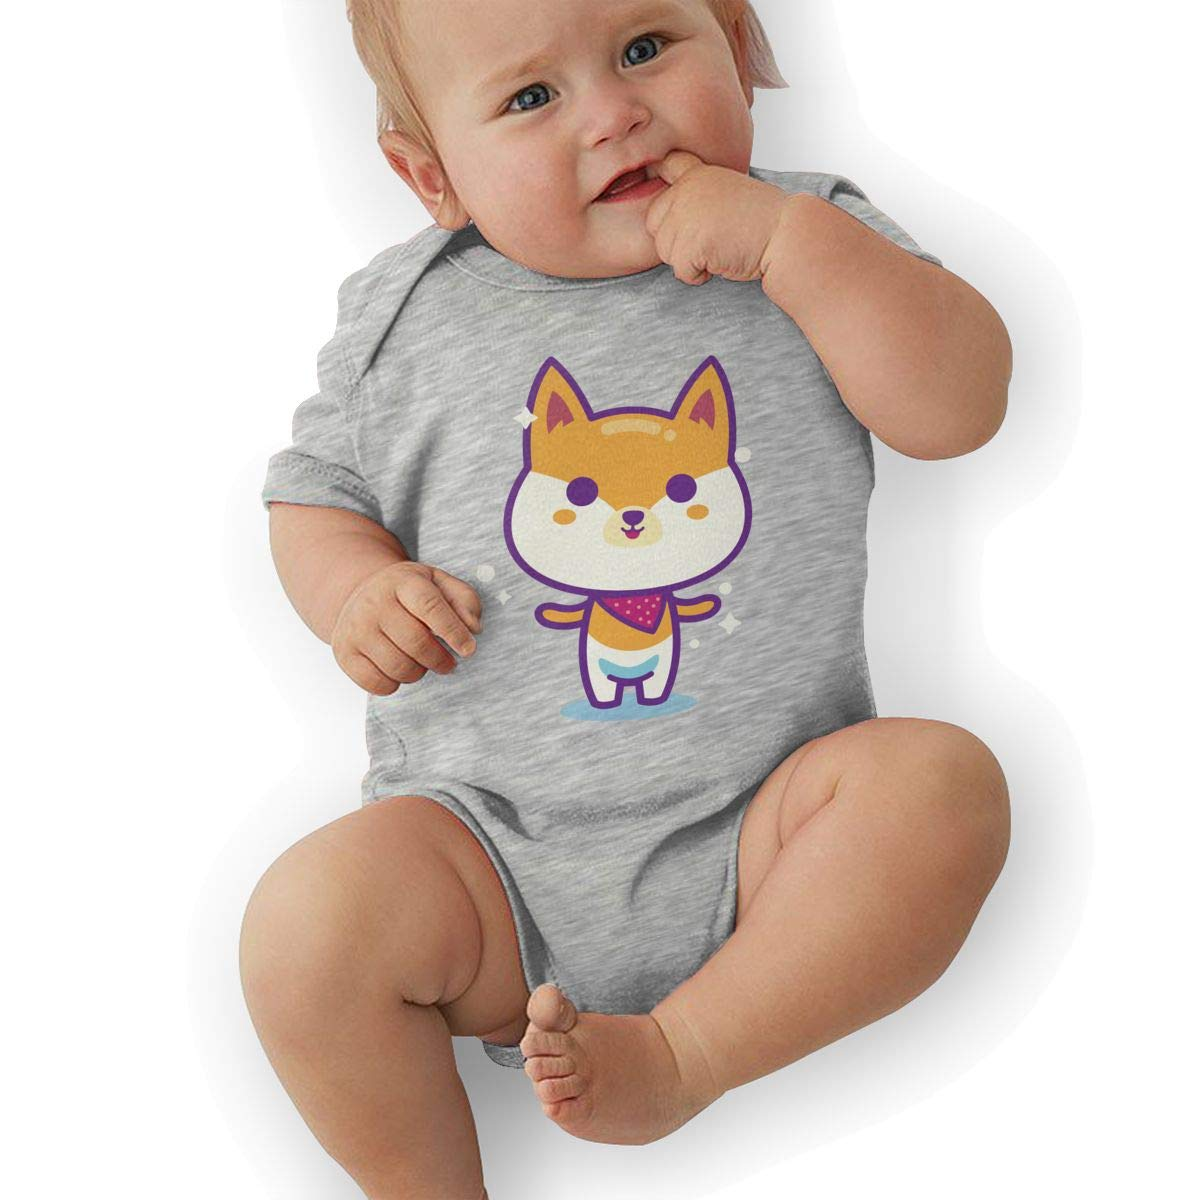 BONLOR Cute Shiba Inu Baby Boys Girls Jumpsuit Overall Romper Bodysuit Summer Clothes Gray